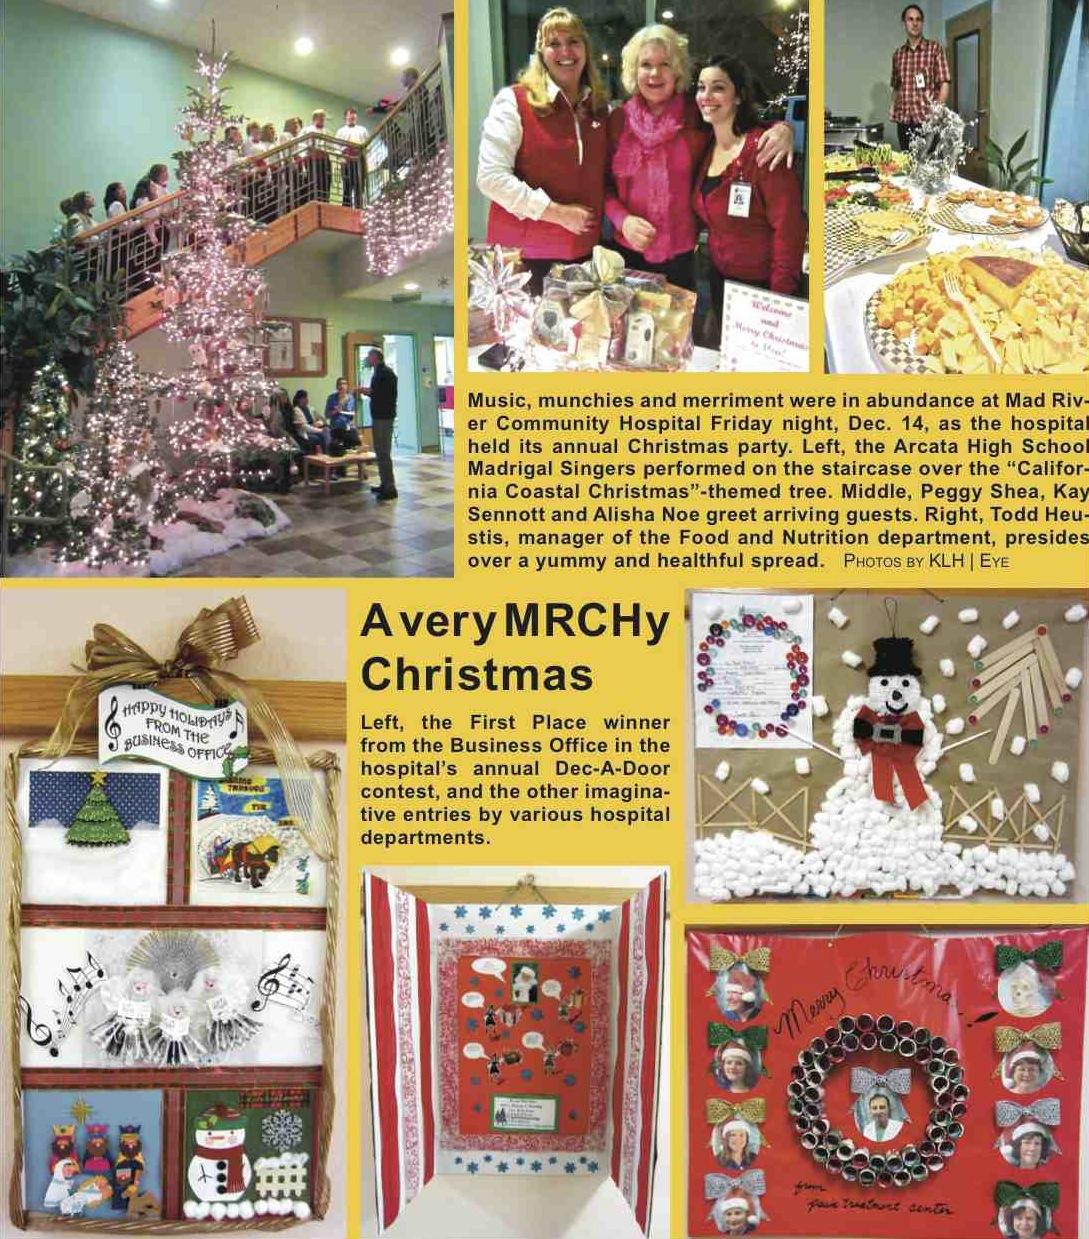 mrchy-christmas